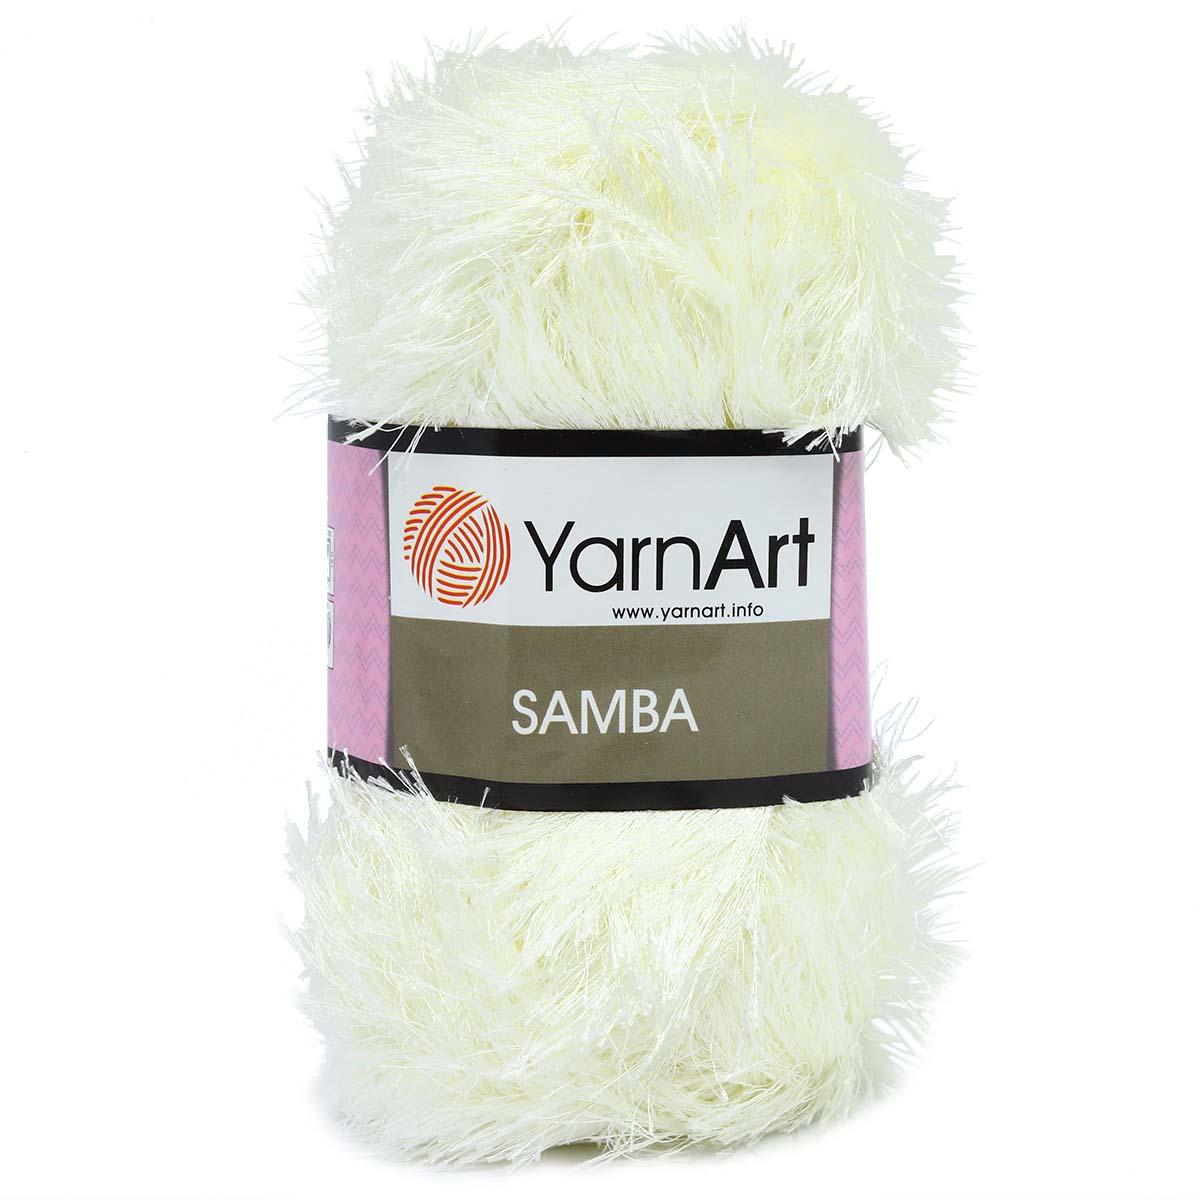 Пряжа YarnArt 'Samba' травка 100гр 150м (100% полиэстер)